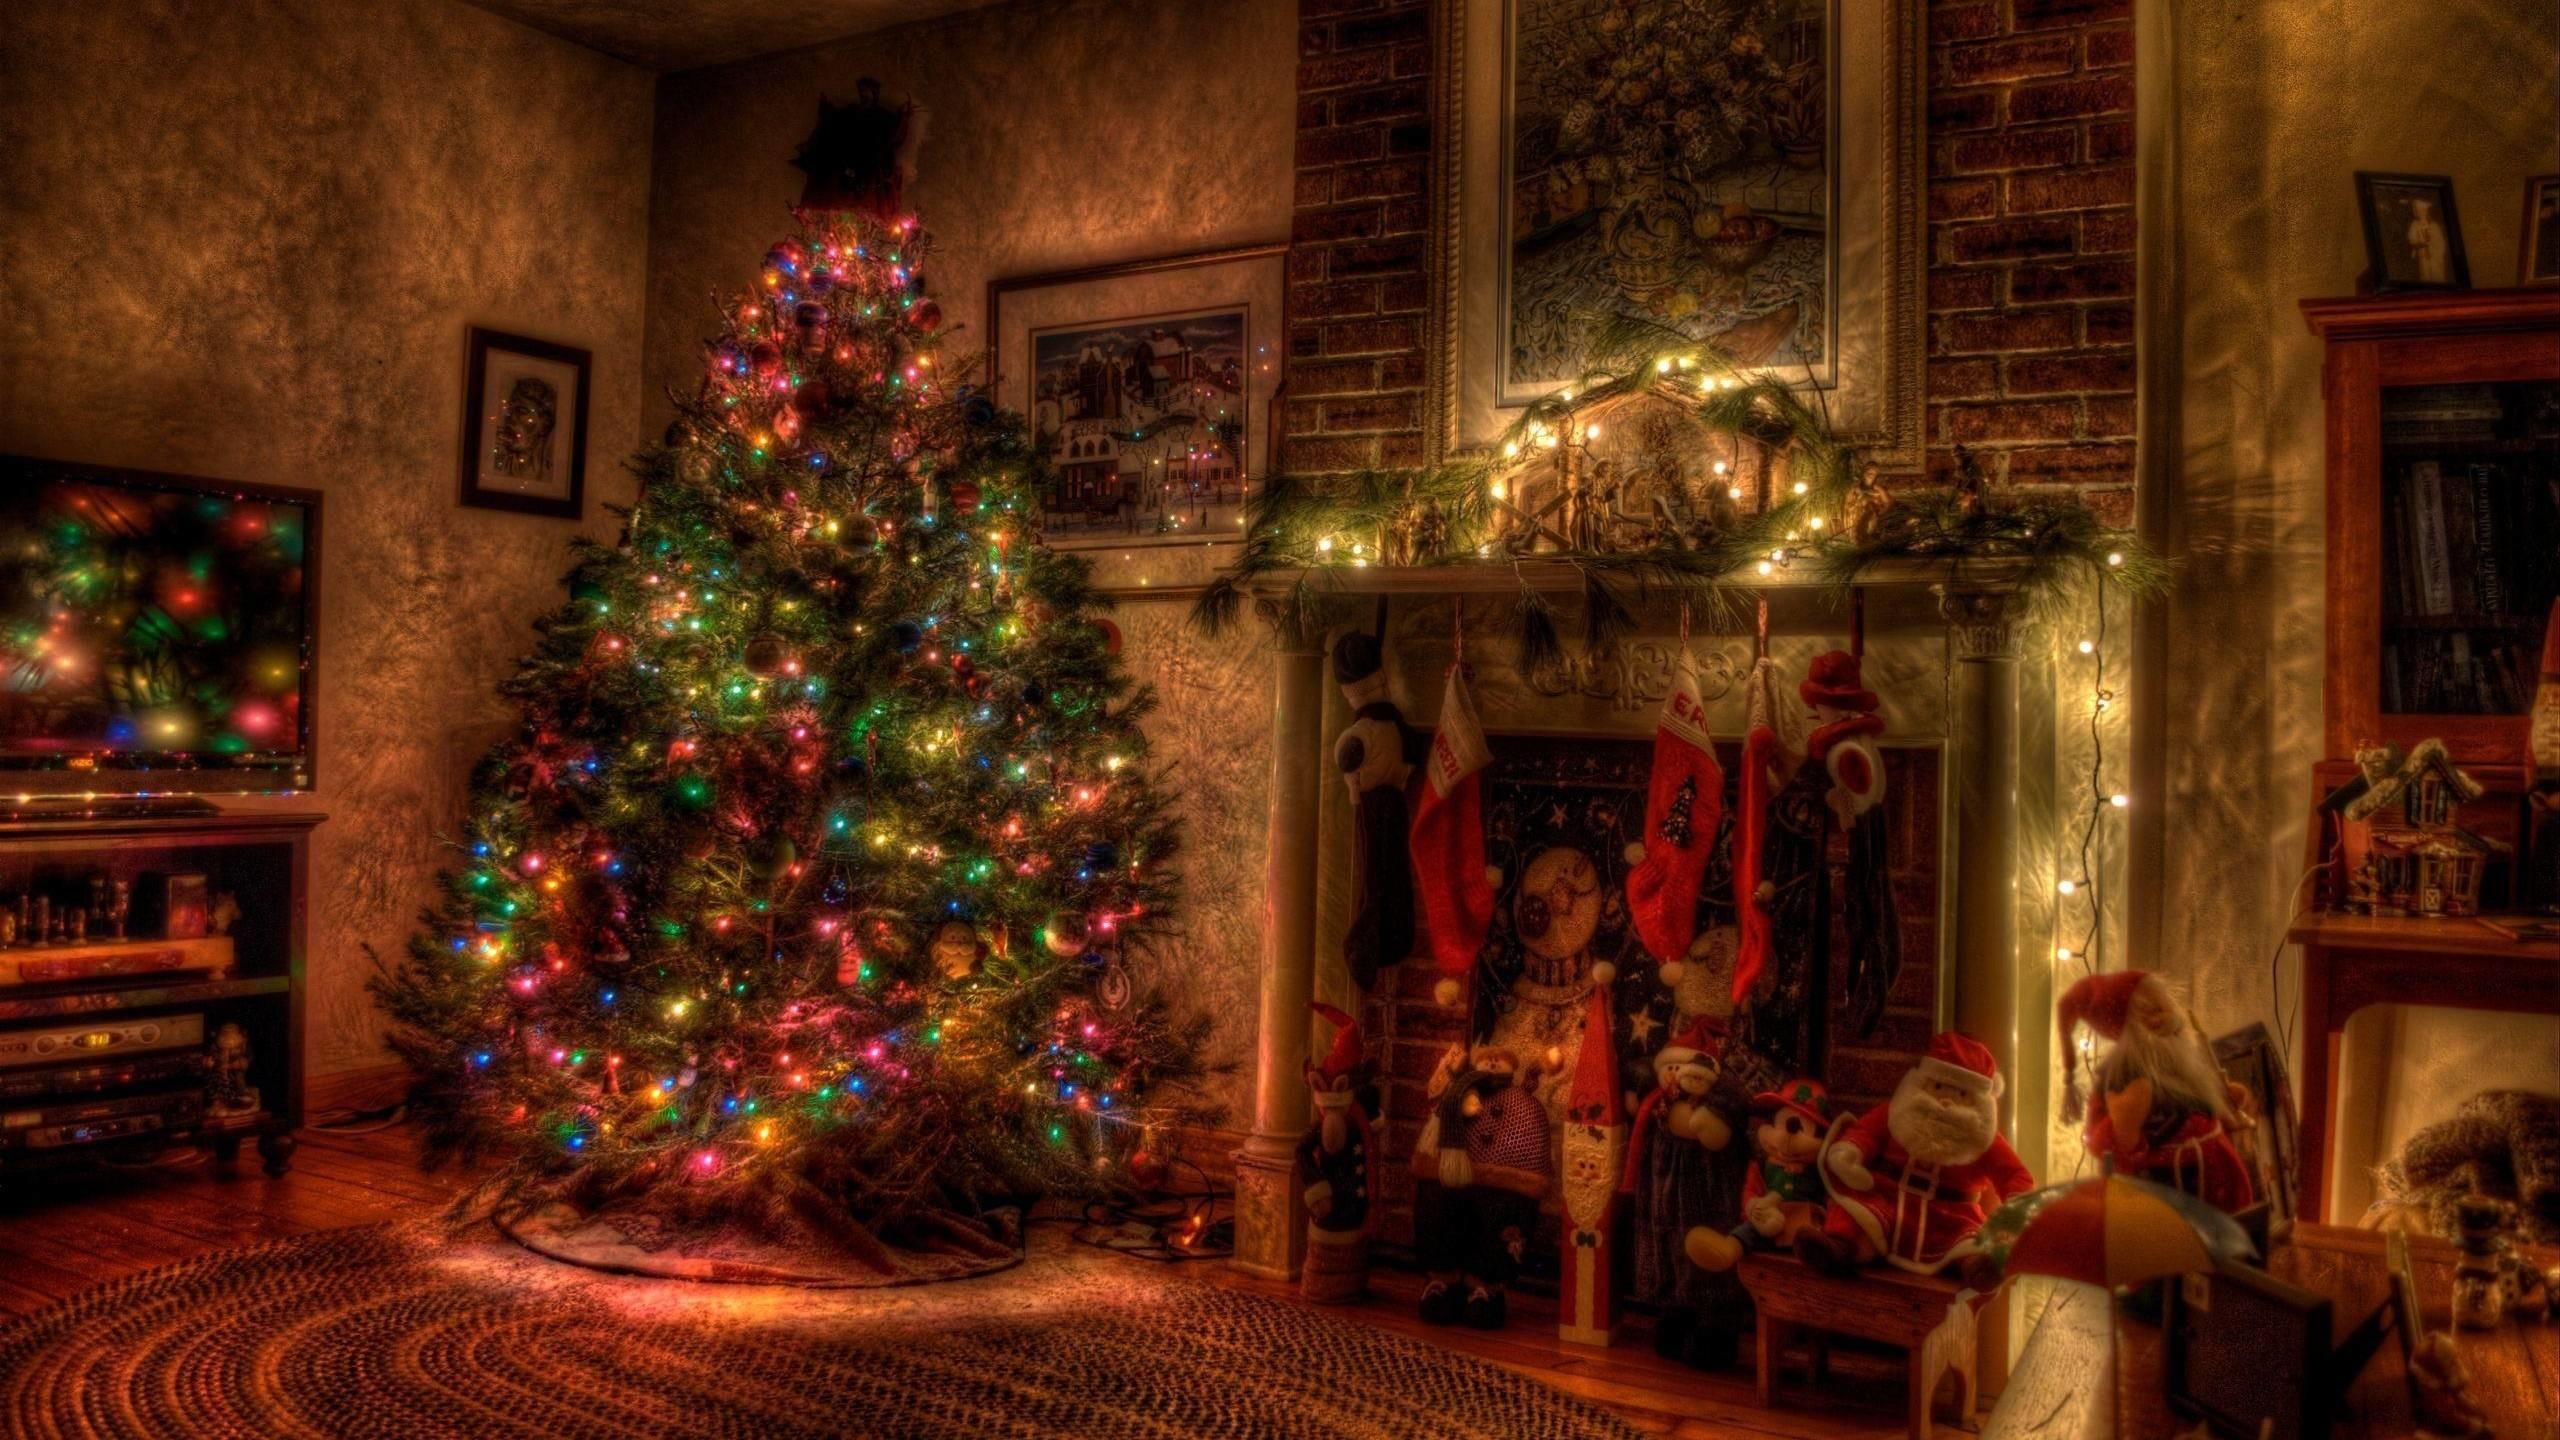 Download Christmas Fireplace Wallpaper